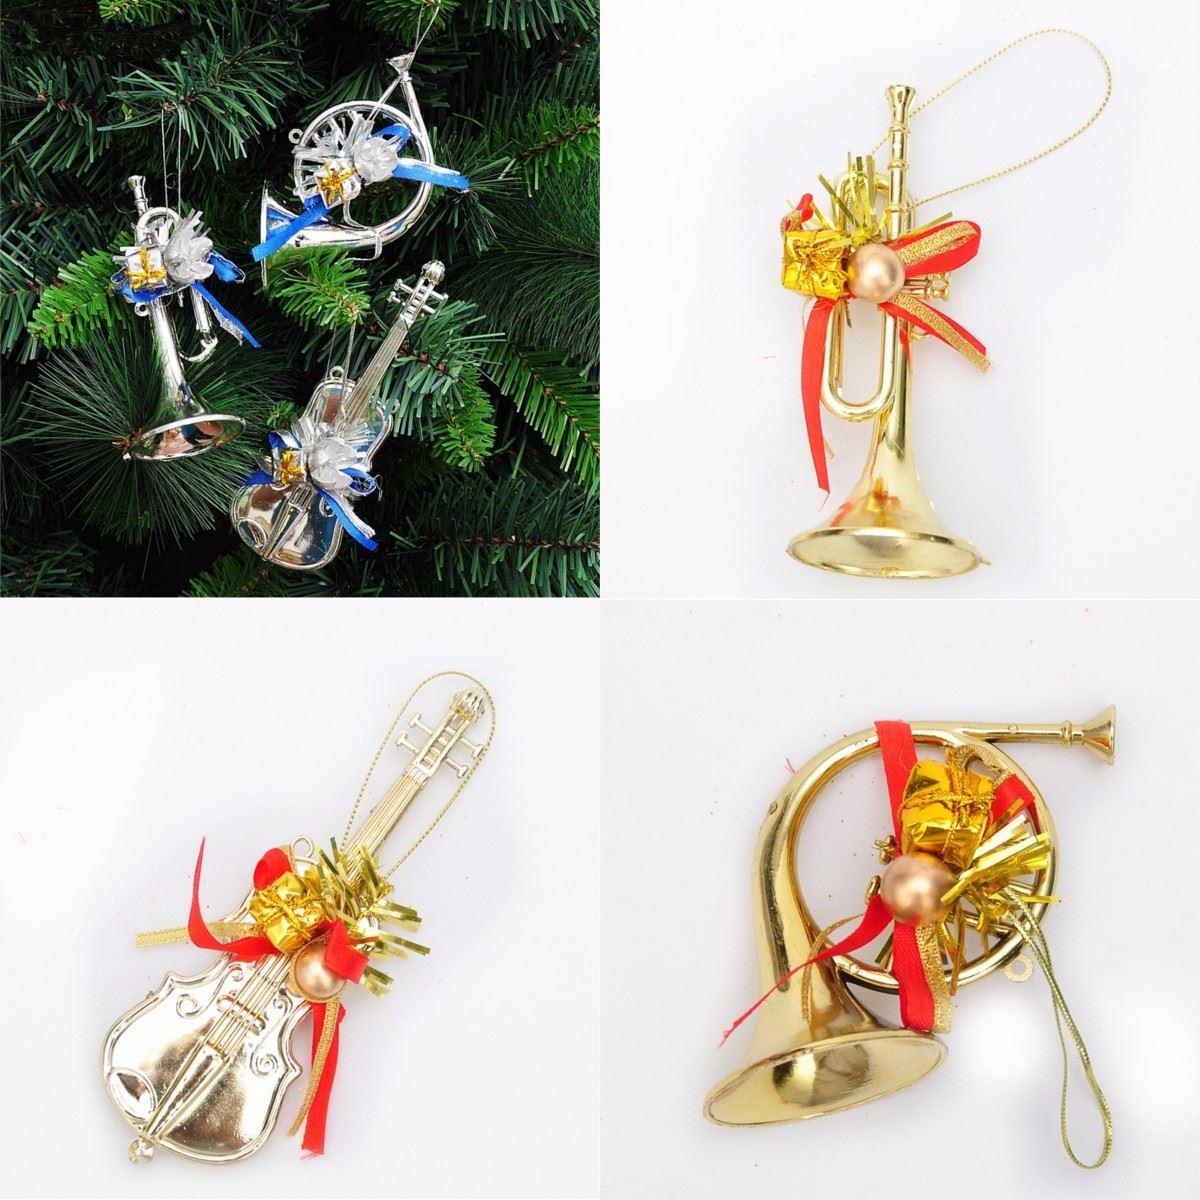 Musical instruments ornaments - 3pcs Christmas Tree Xmas Baubles Decoration Ornaments Light Musical Instrument Hot Sale